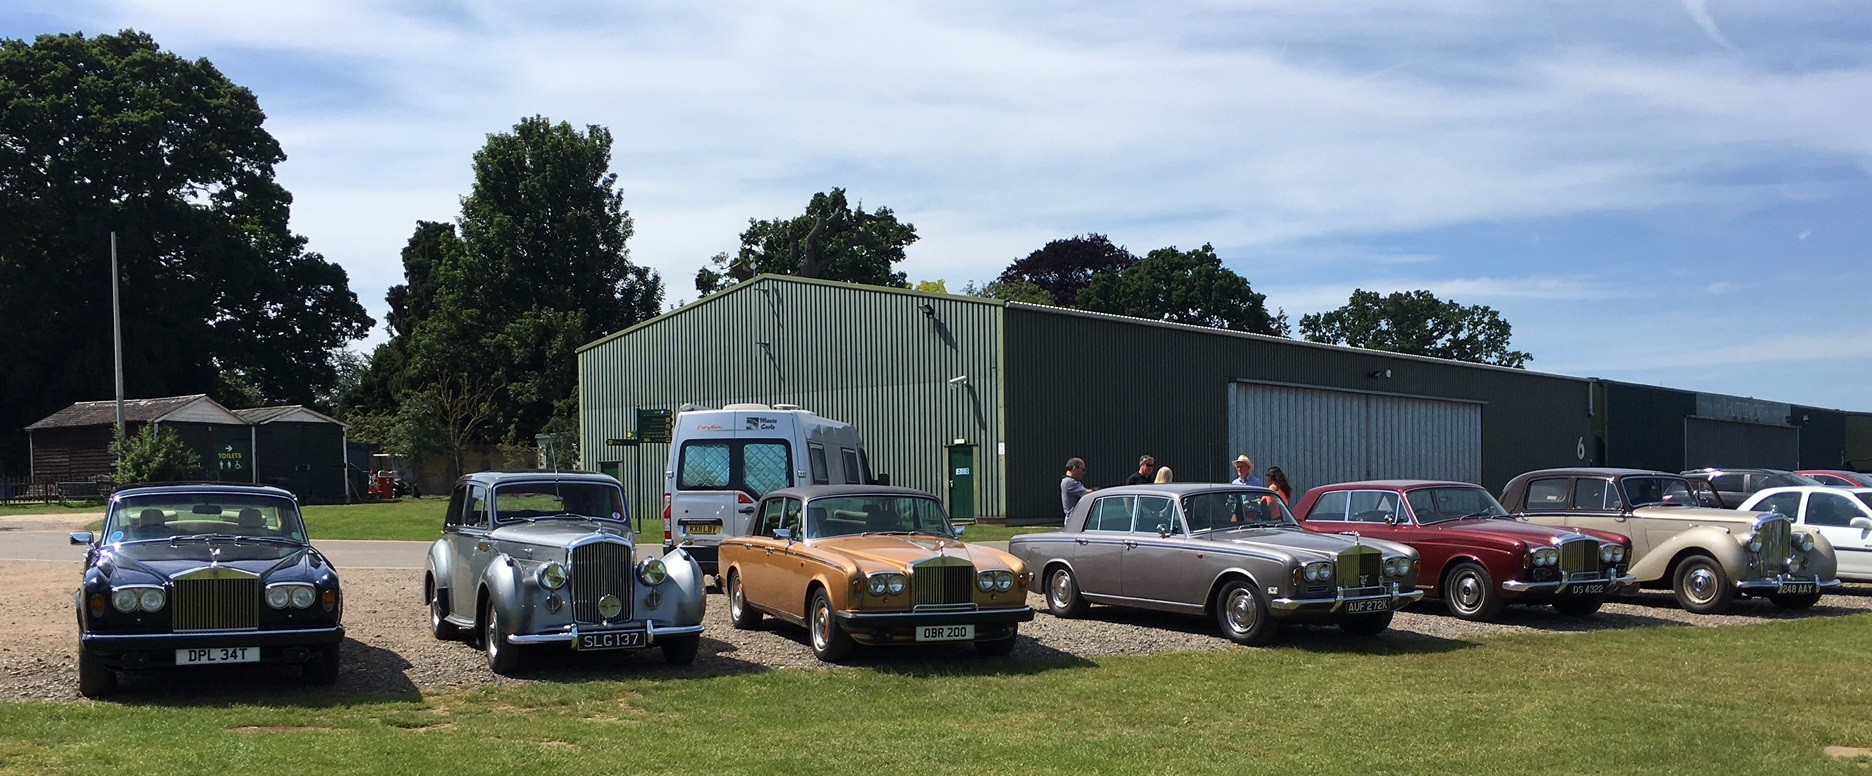 Club cars at Shuttleworth